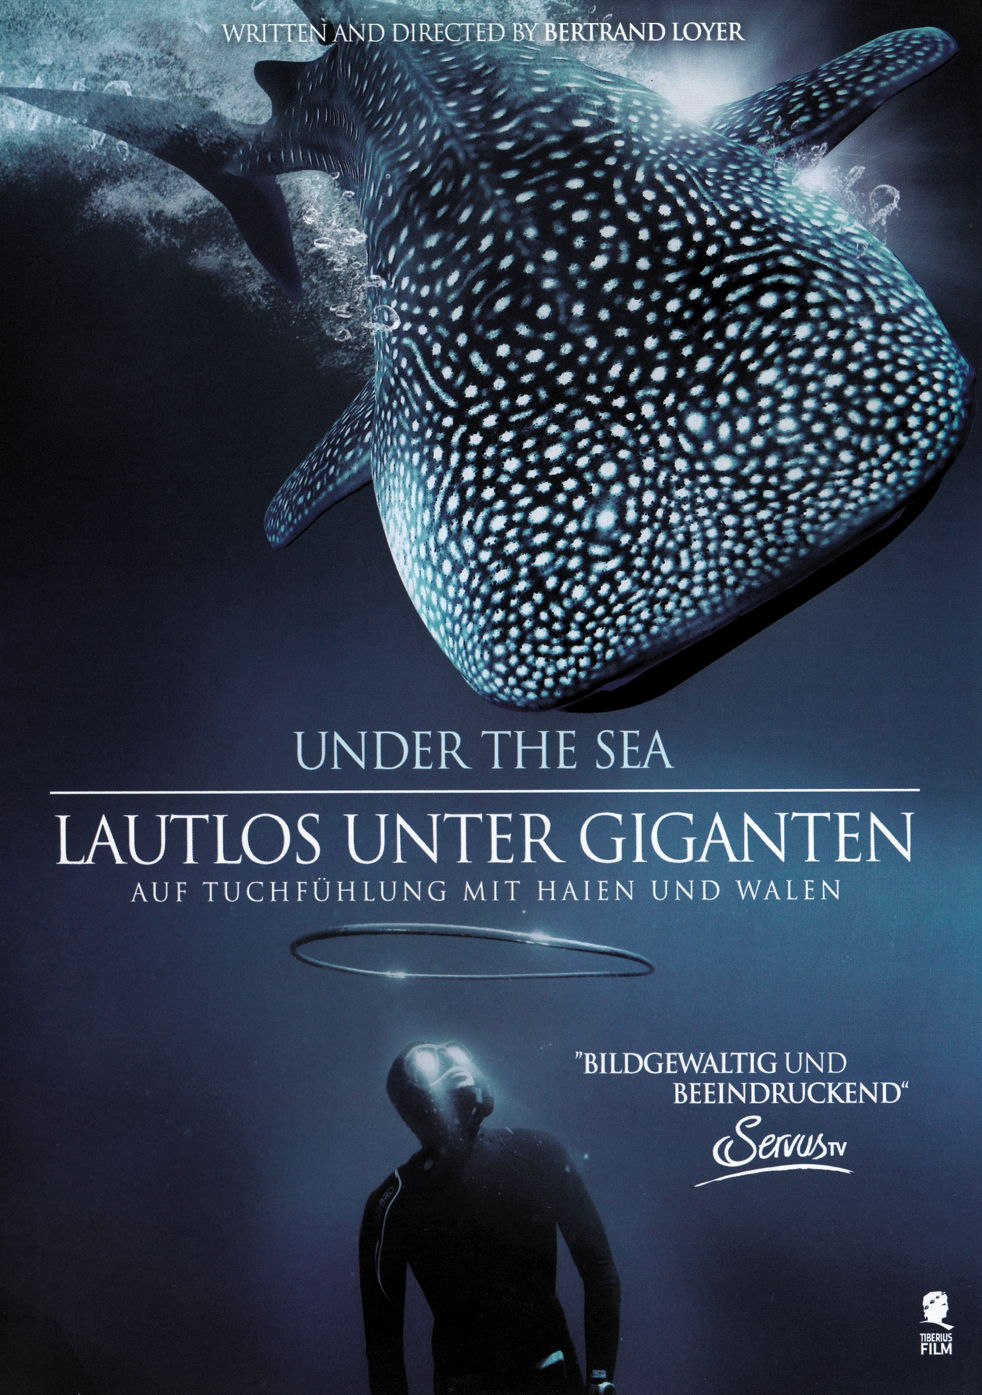 Under the Sea - Lautlos unter Giganten